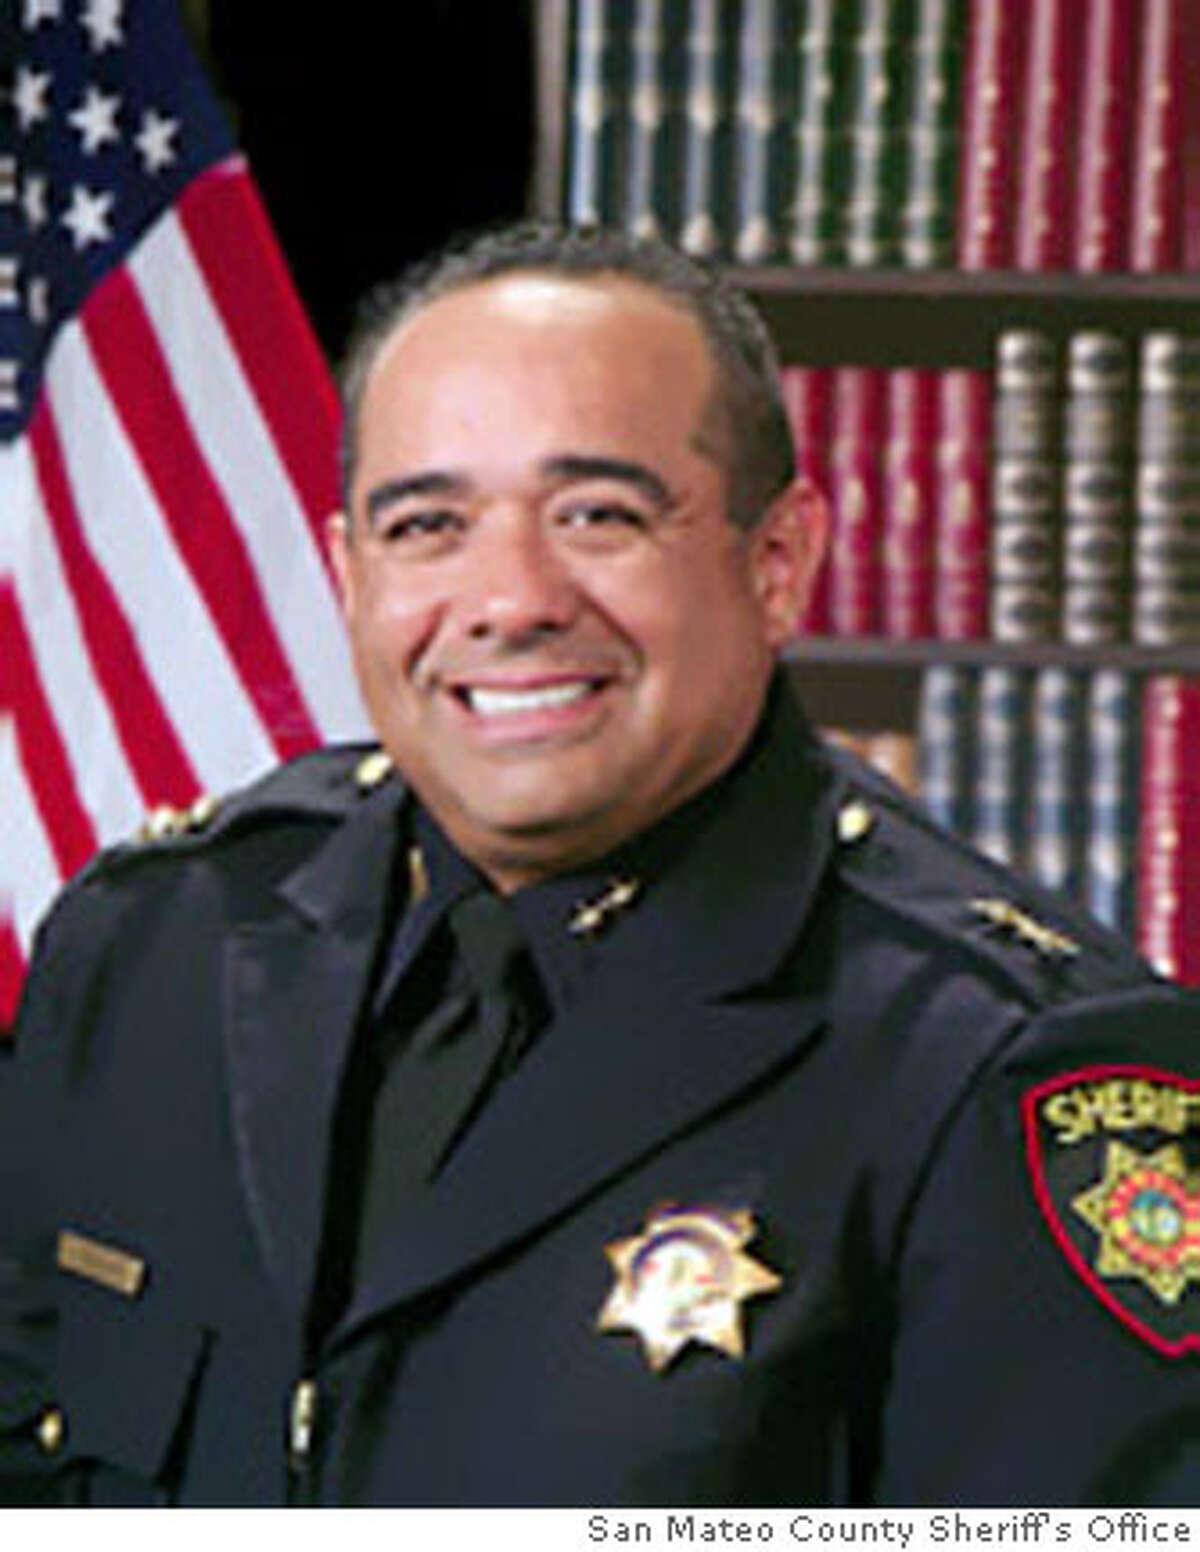 Carlos Bolanos. Photo courtesy of the San Mateo County Sheriff's Office